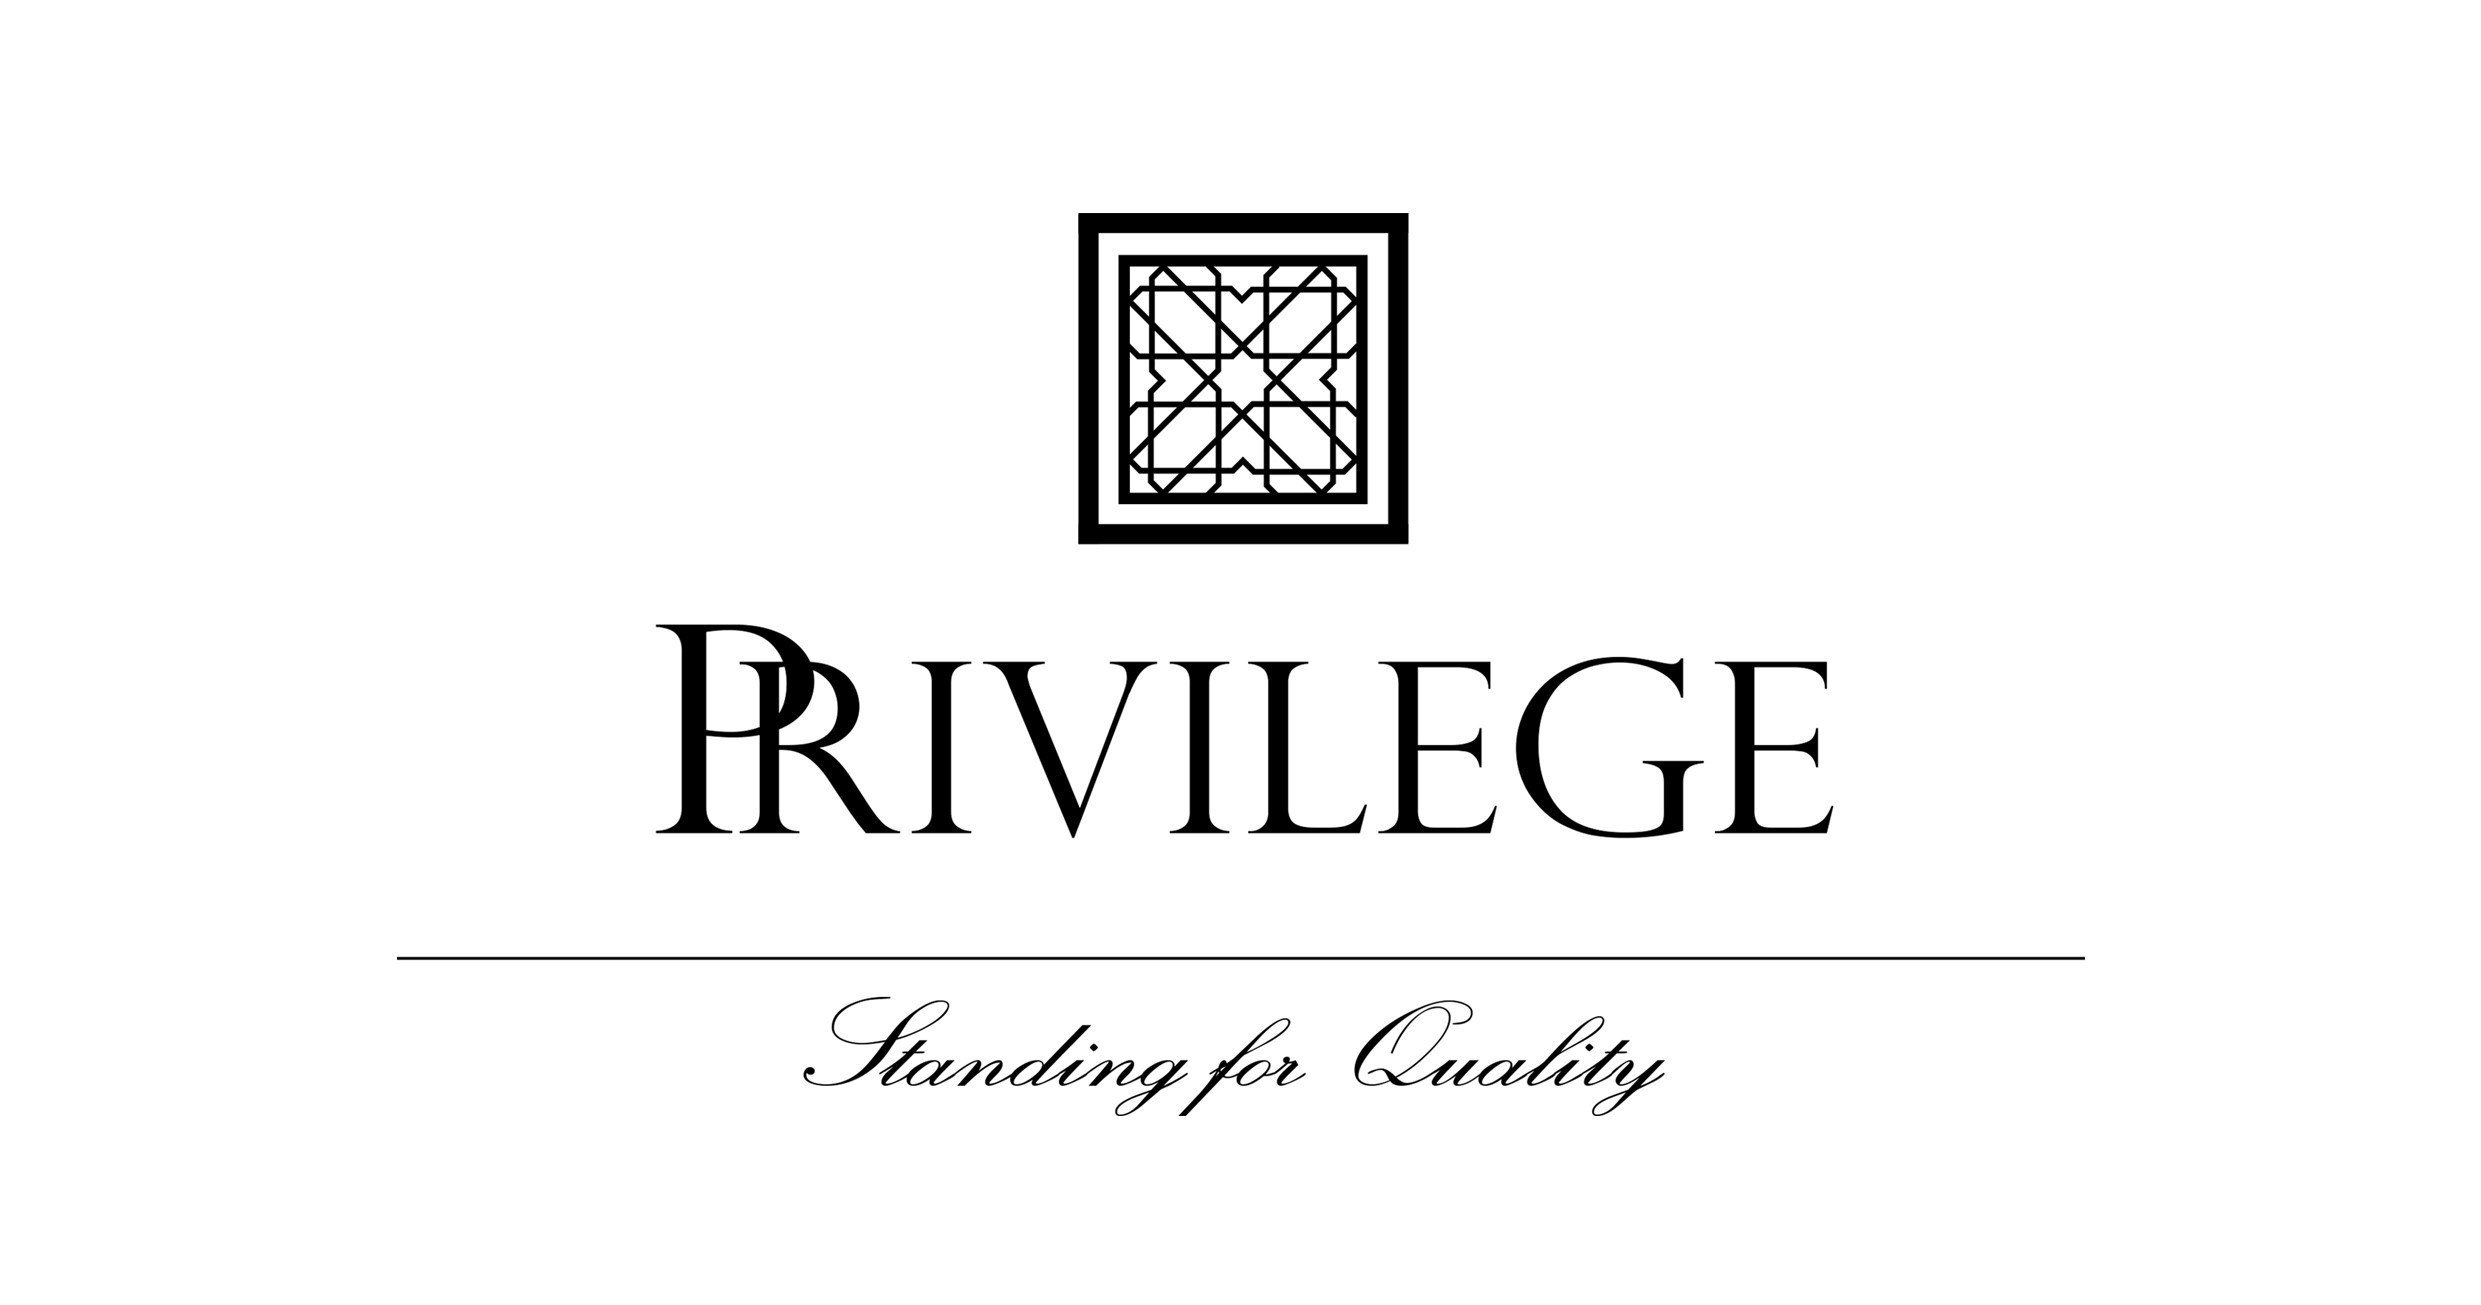 privilege_SFQ.jpg